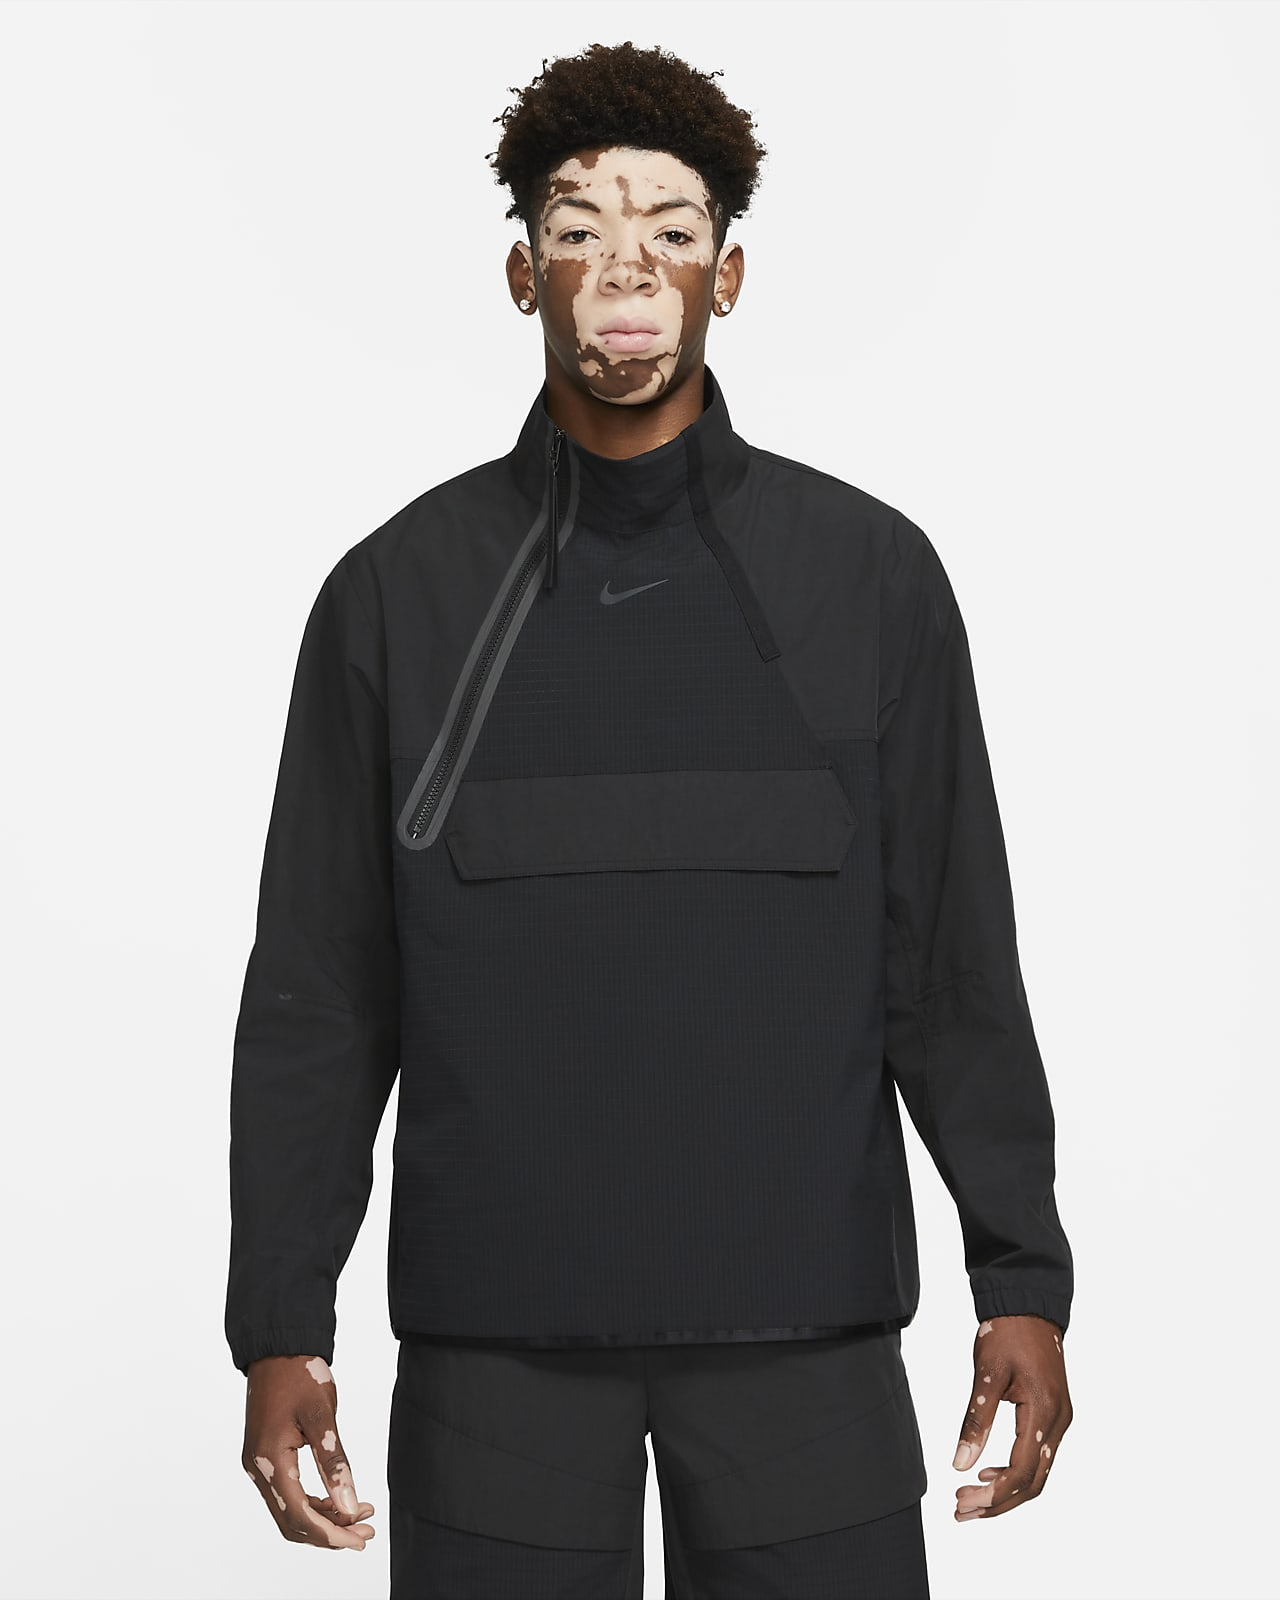 Giacca in tessuto con zip a metà lunghezza Nike Sportswear Tech Pack - Uomo